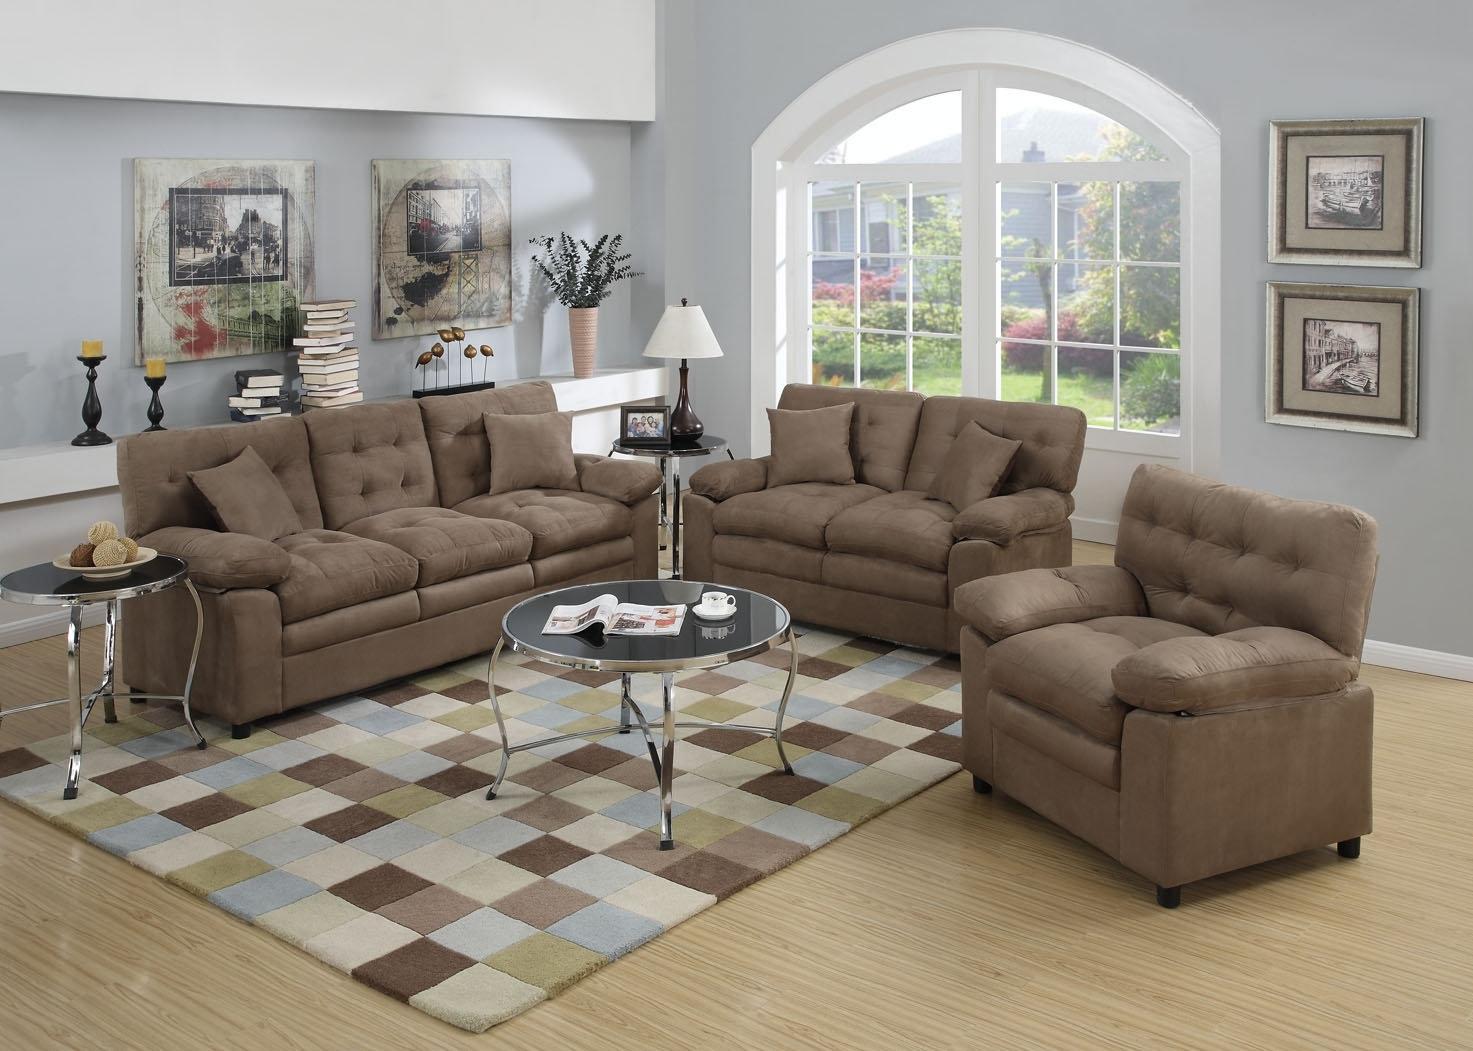 Red Barrel Studio Kingston 3 Piece Living Room Set | Wayfair Throughout Kingston Sectional Sofas (View 9 of 10)